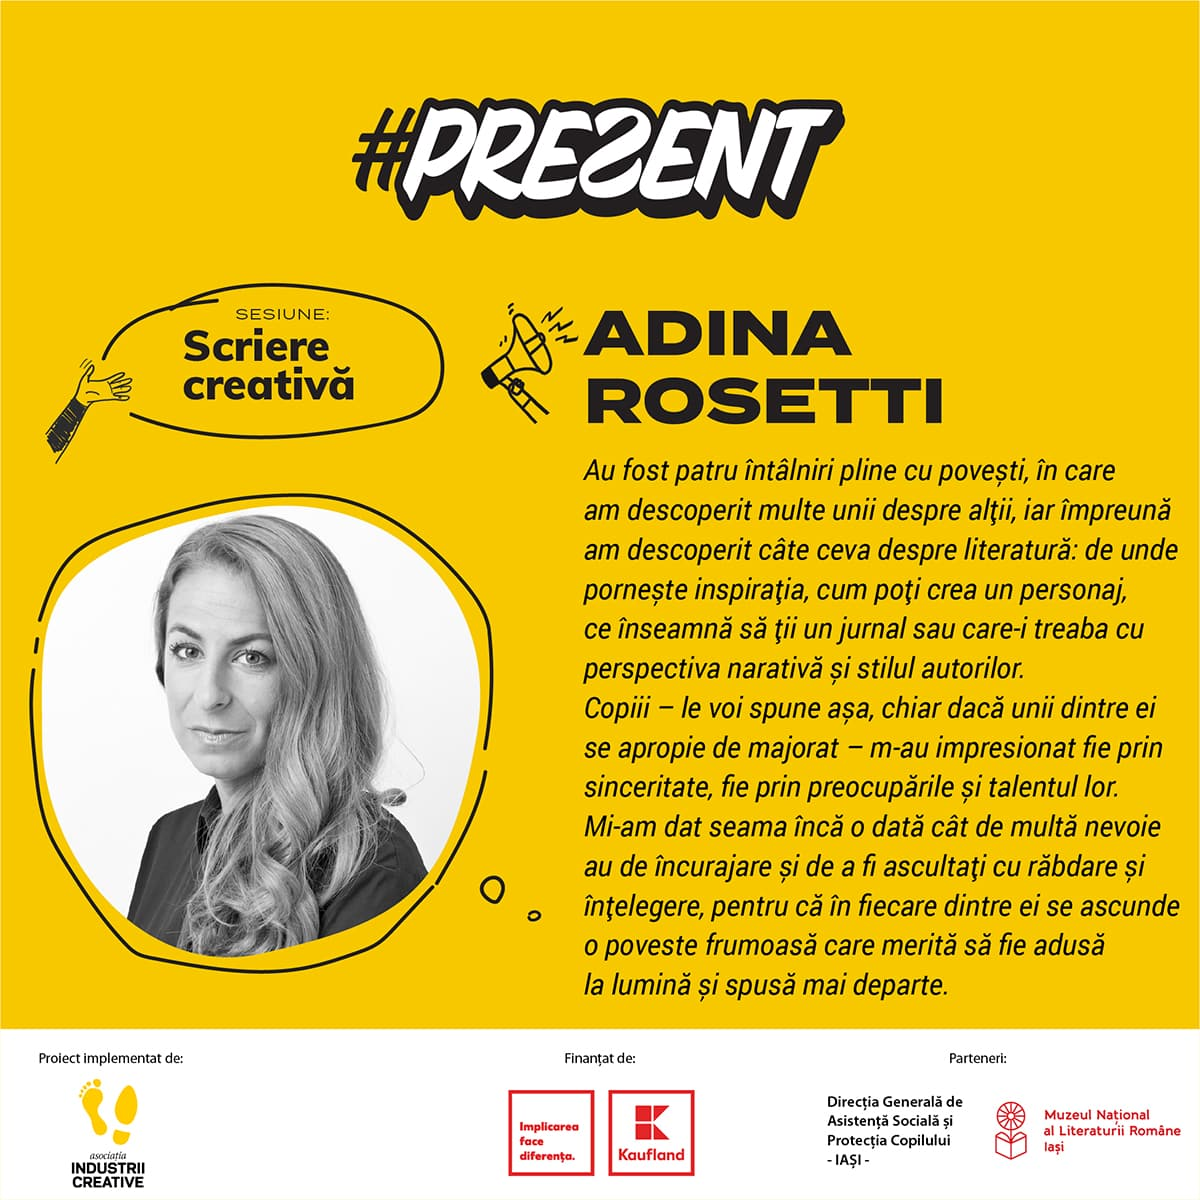 04-adina-rosetti